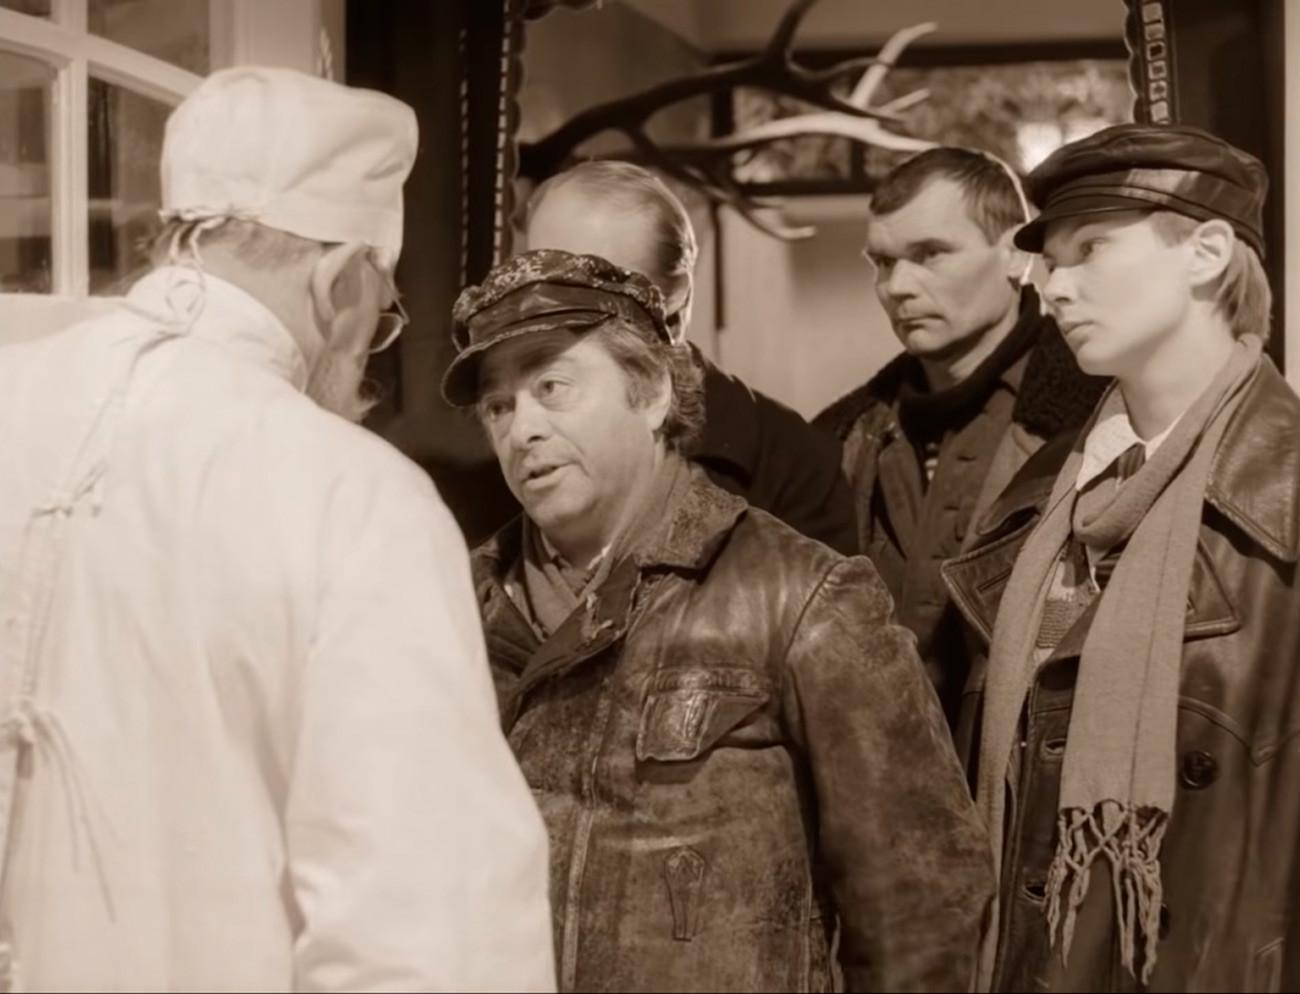 Scena iz filma Vladimira Bortka